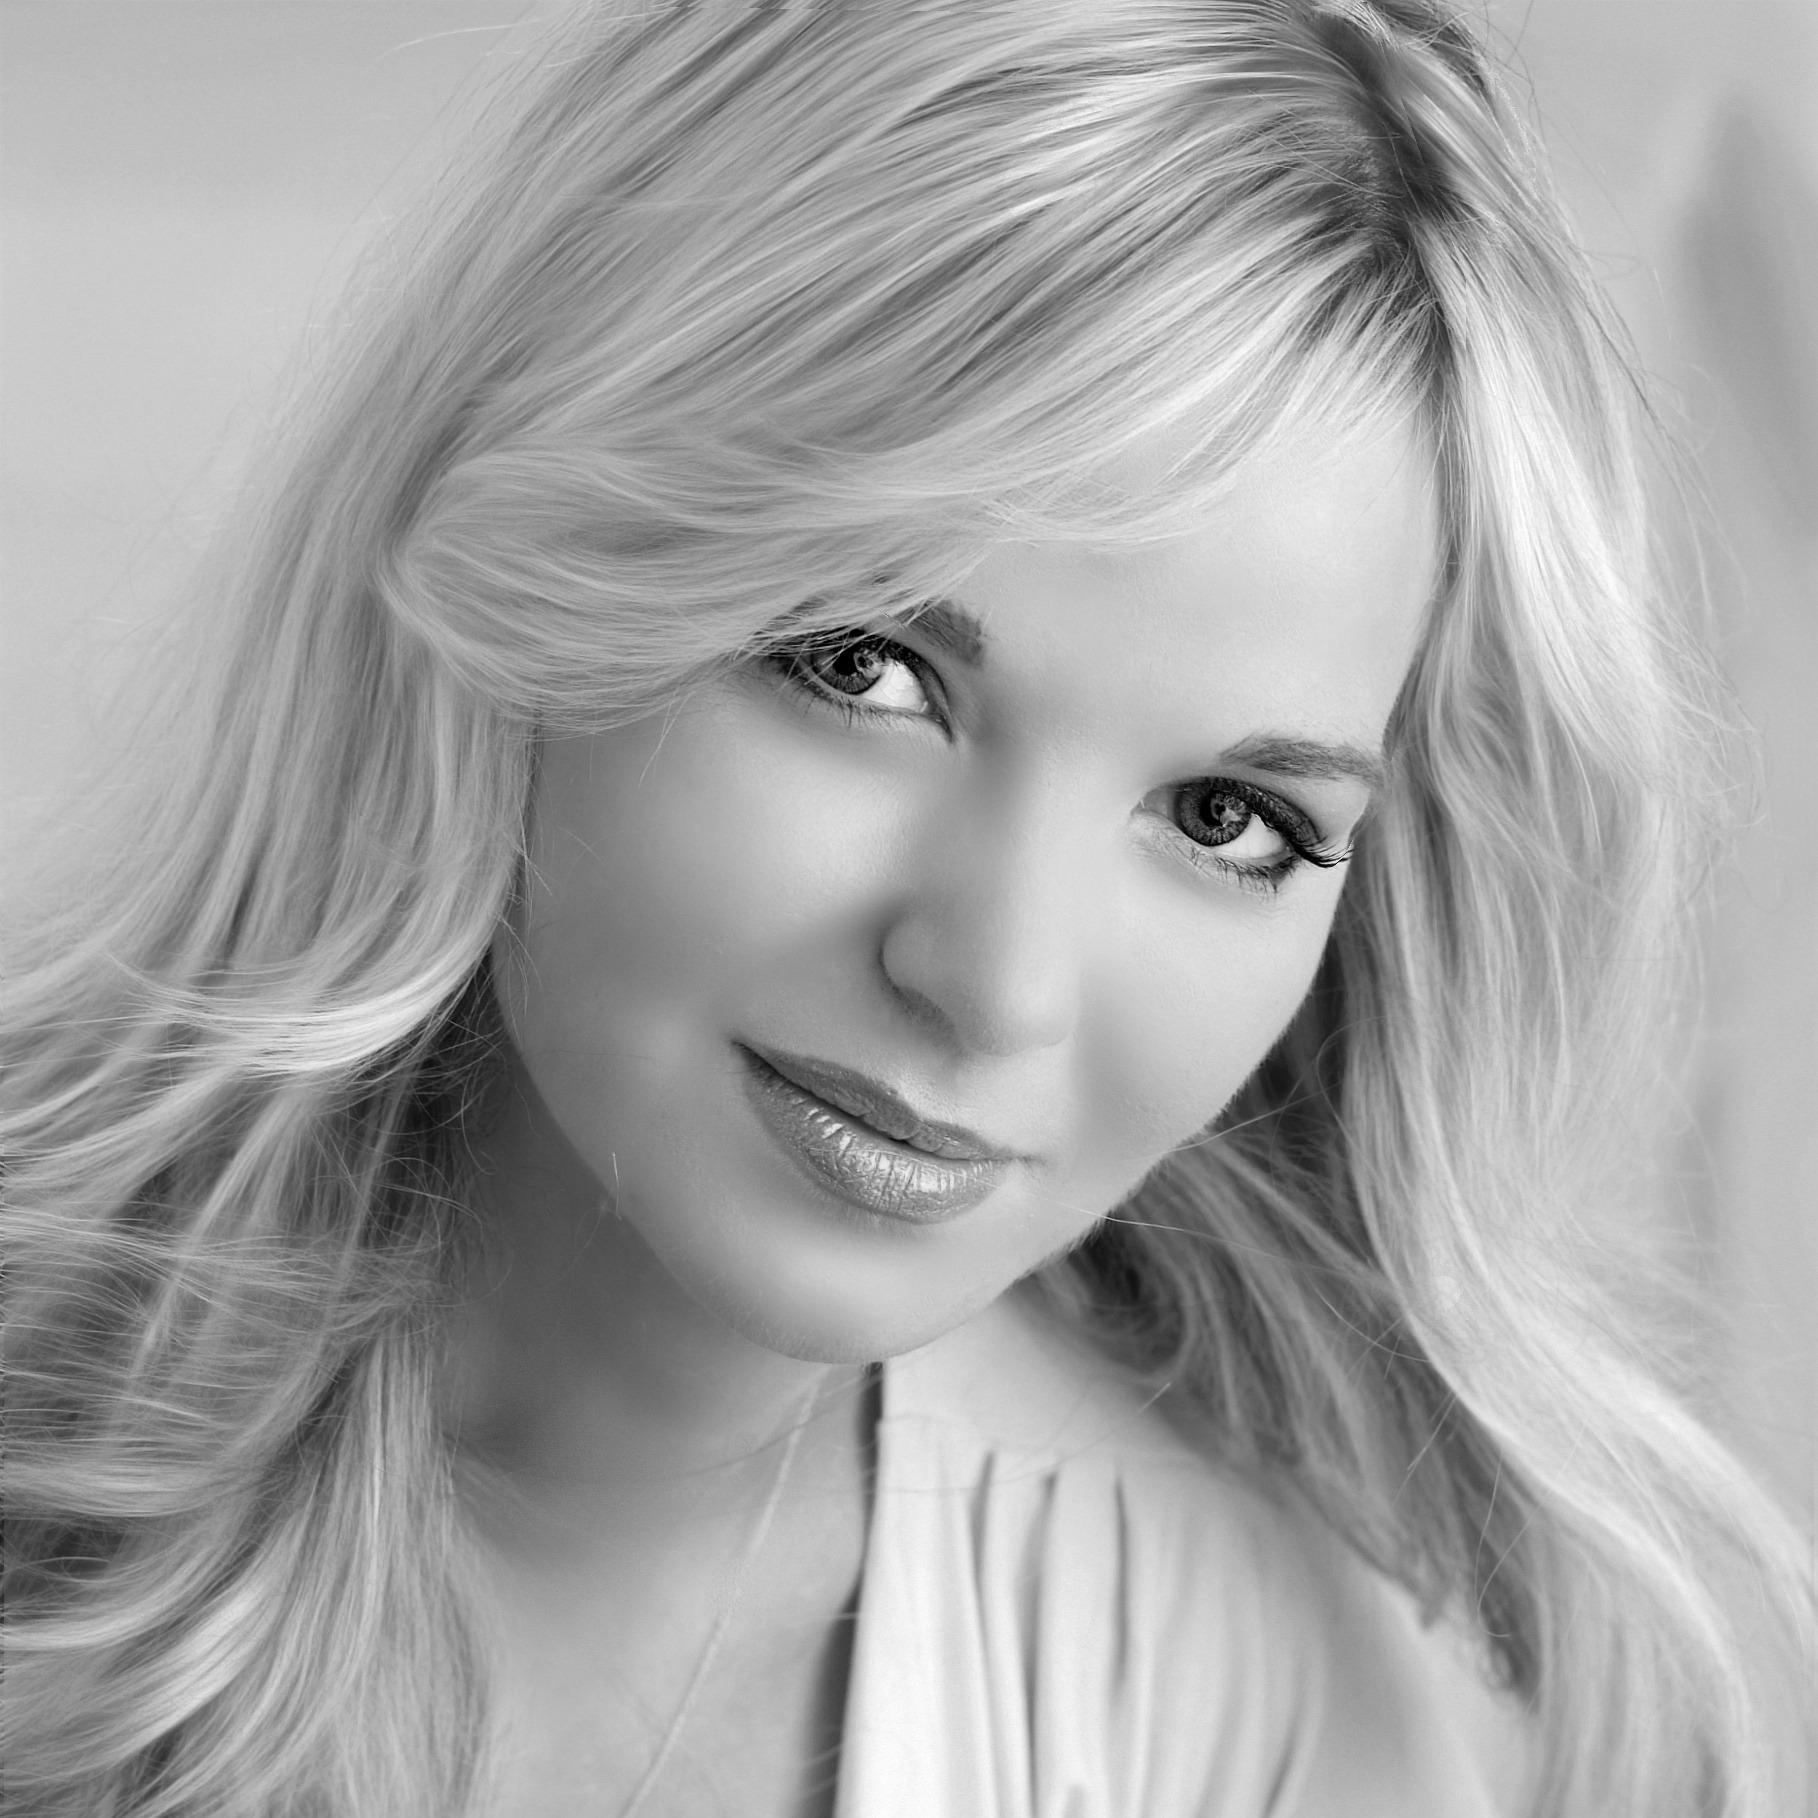 Vocalist Doreen Taylor